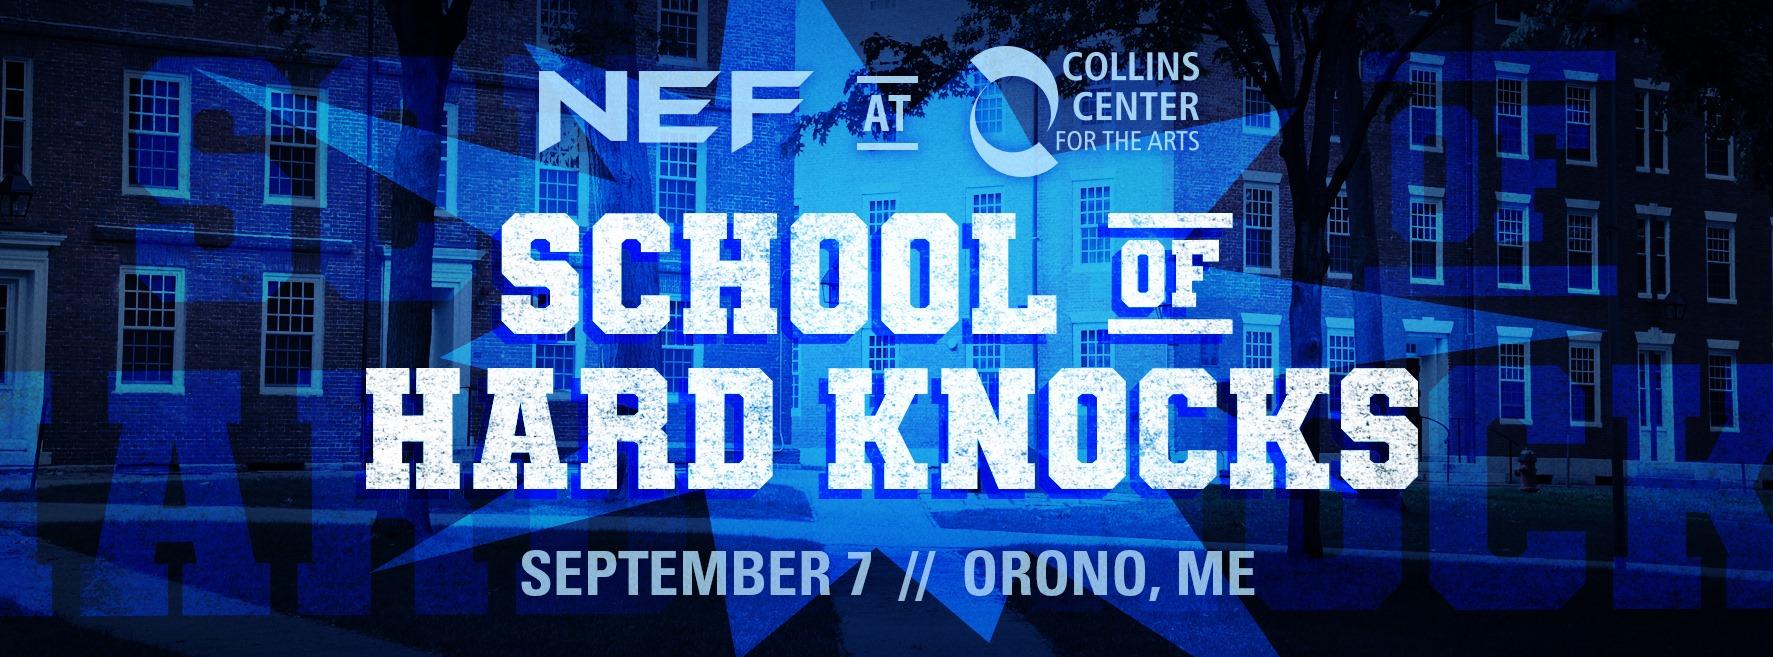 New England Fights - School of hard knocks